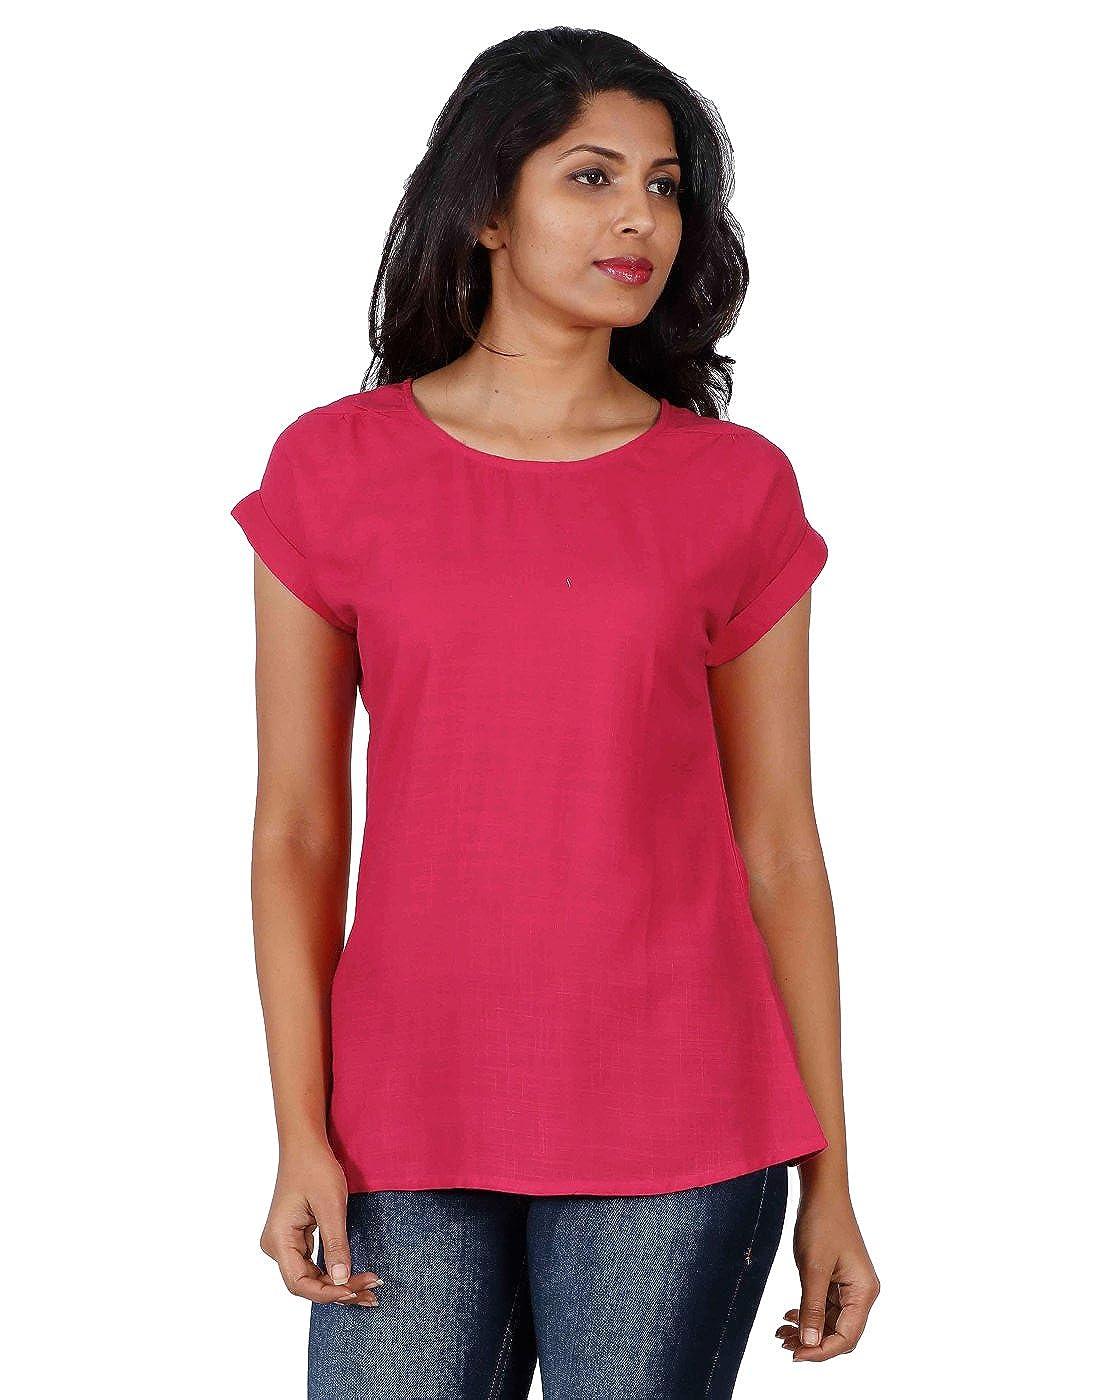 c86e12e5c4ee ESTYLE Raspberry Pink Round Neckline Indo-Western Top (Medium)  Amazon.in   Clothing   Accessories